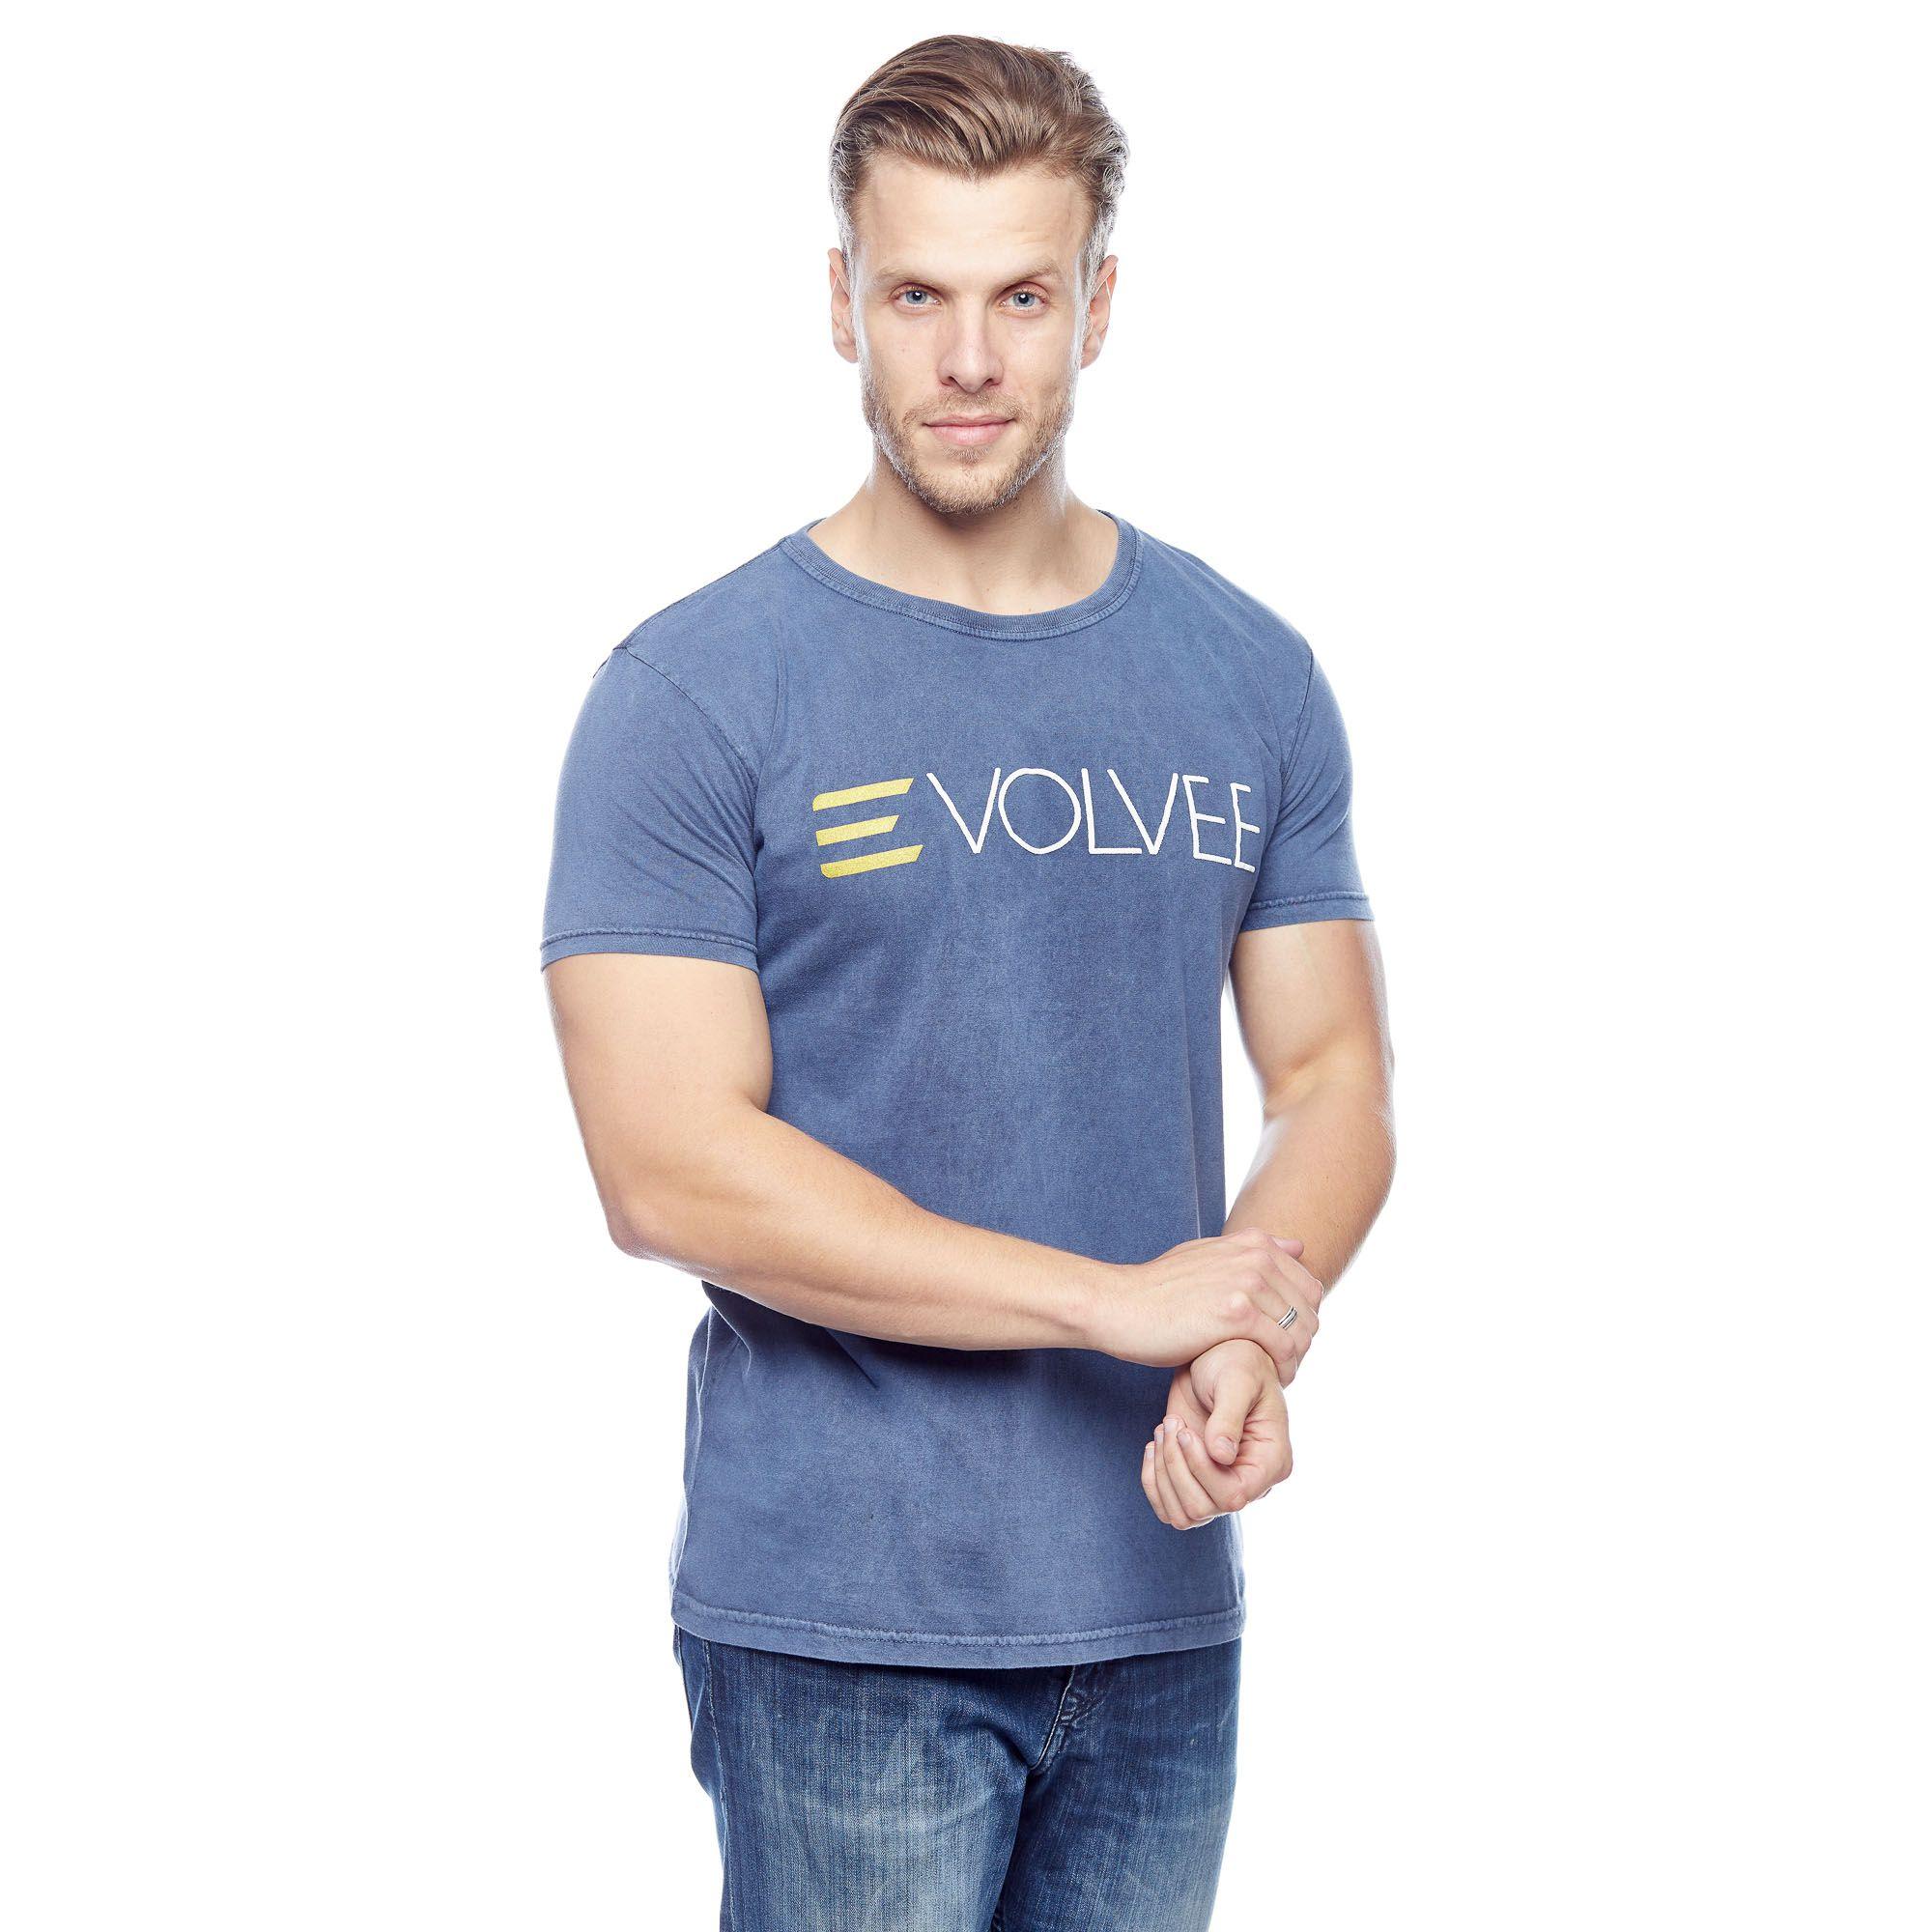 Camiseta Evolvee Básica Marmorizada Tradicional Masculina